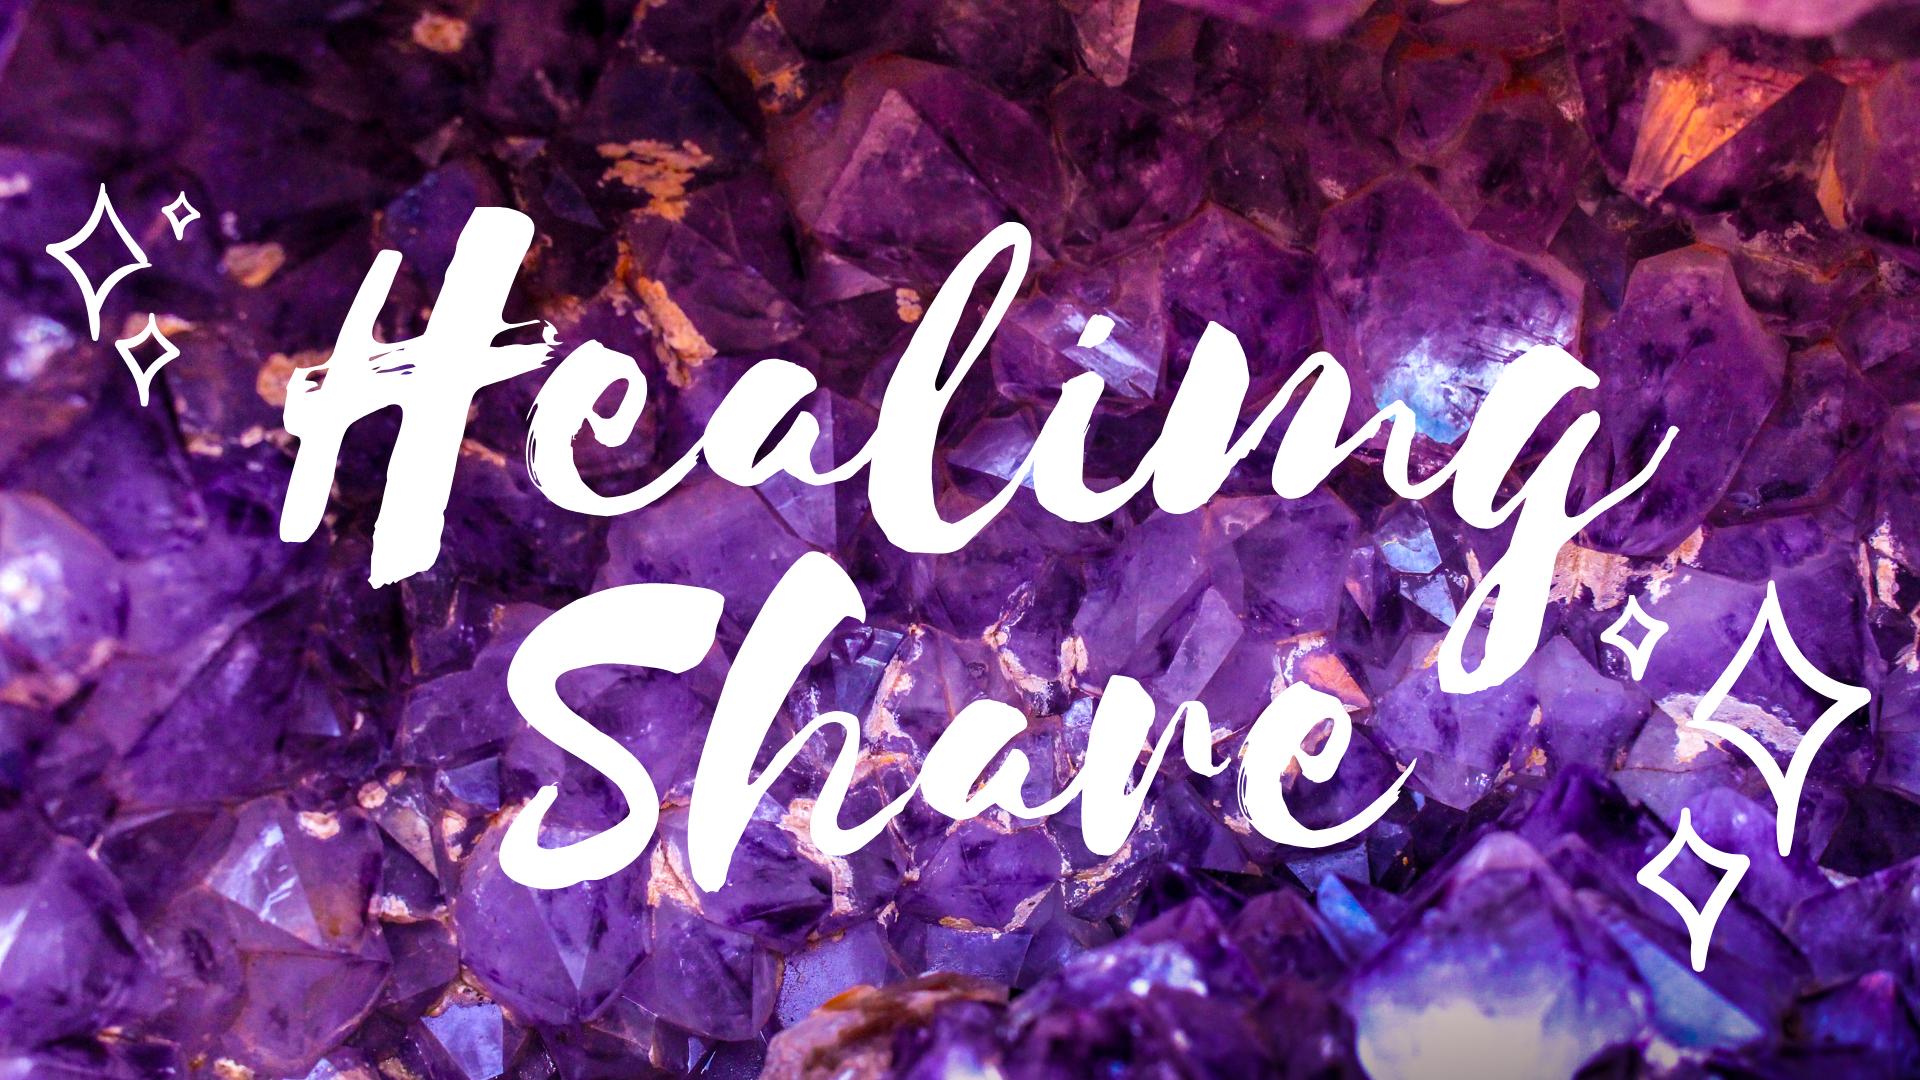 Healing Share.png